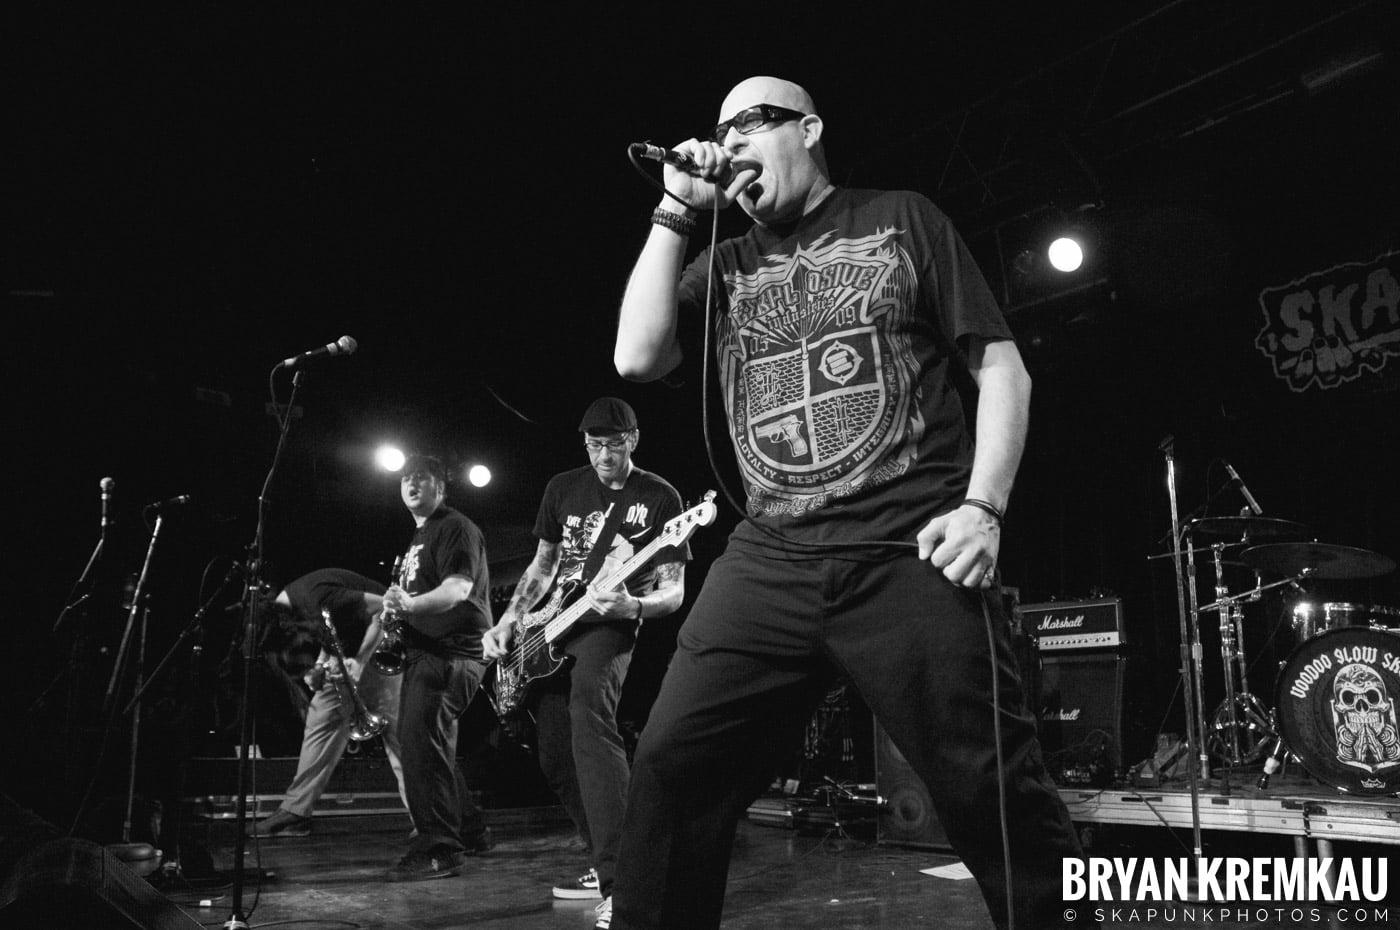 Voodoo Glow Skulls (Ska is Dead Tour) @ Starland Ballroom, Sayreville, NJ - 11.15.09 (5)